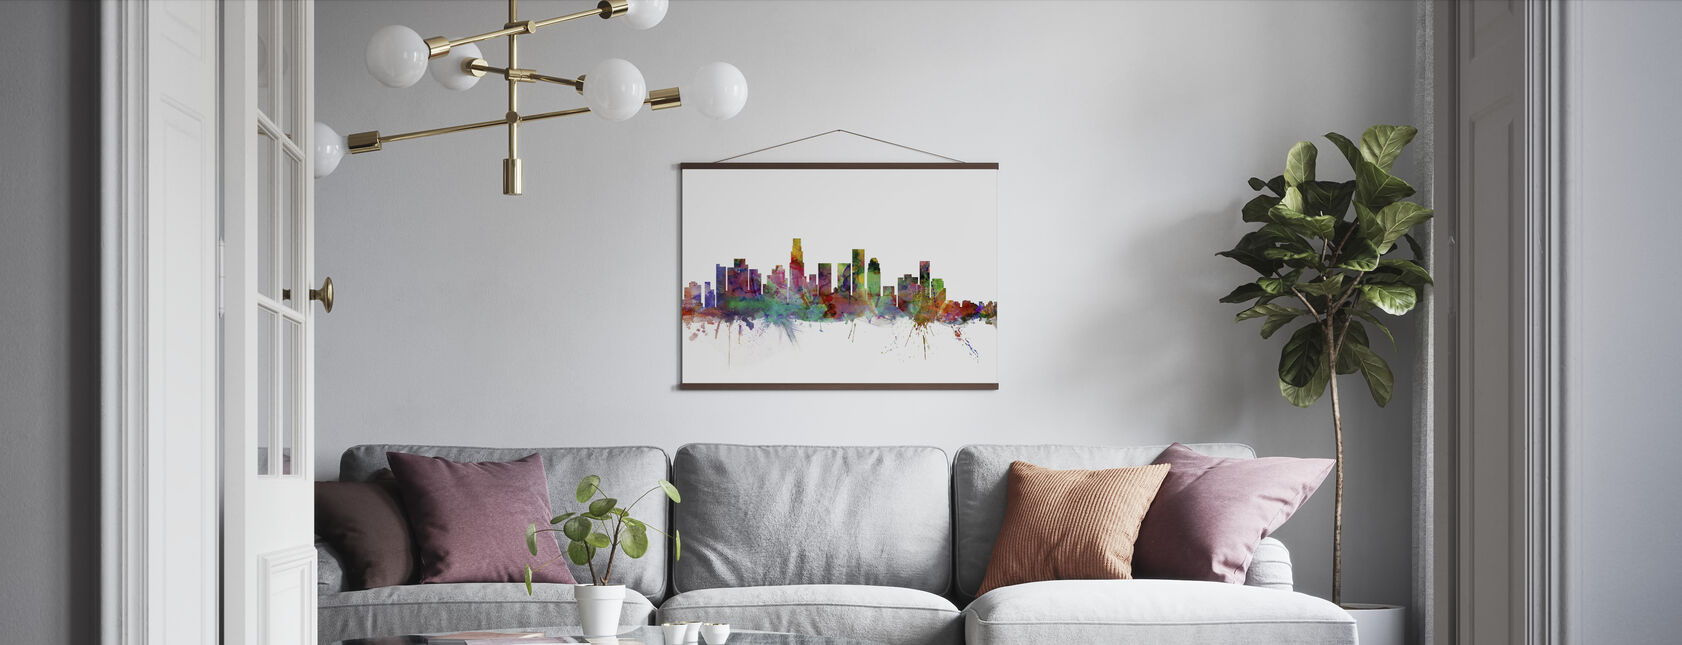 Los Angeles Skyline - Poster - Living Room